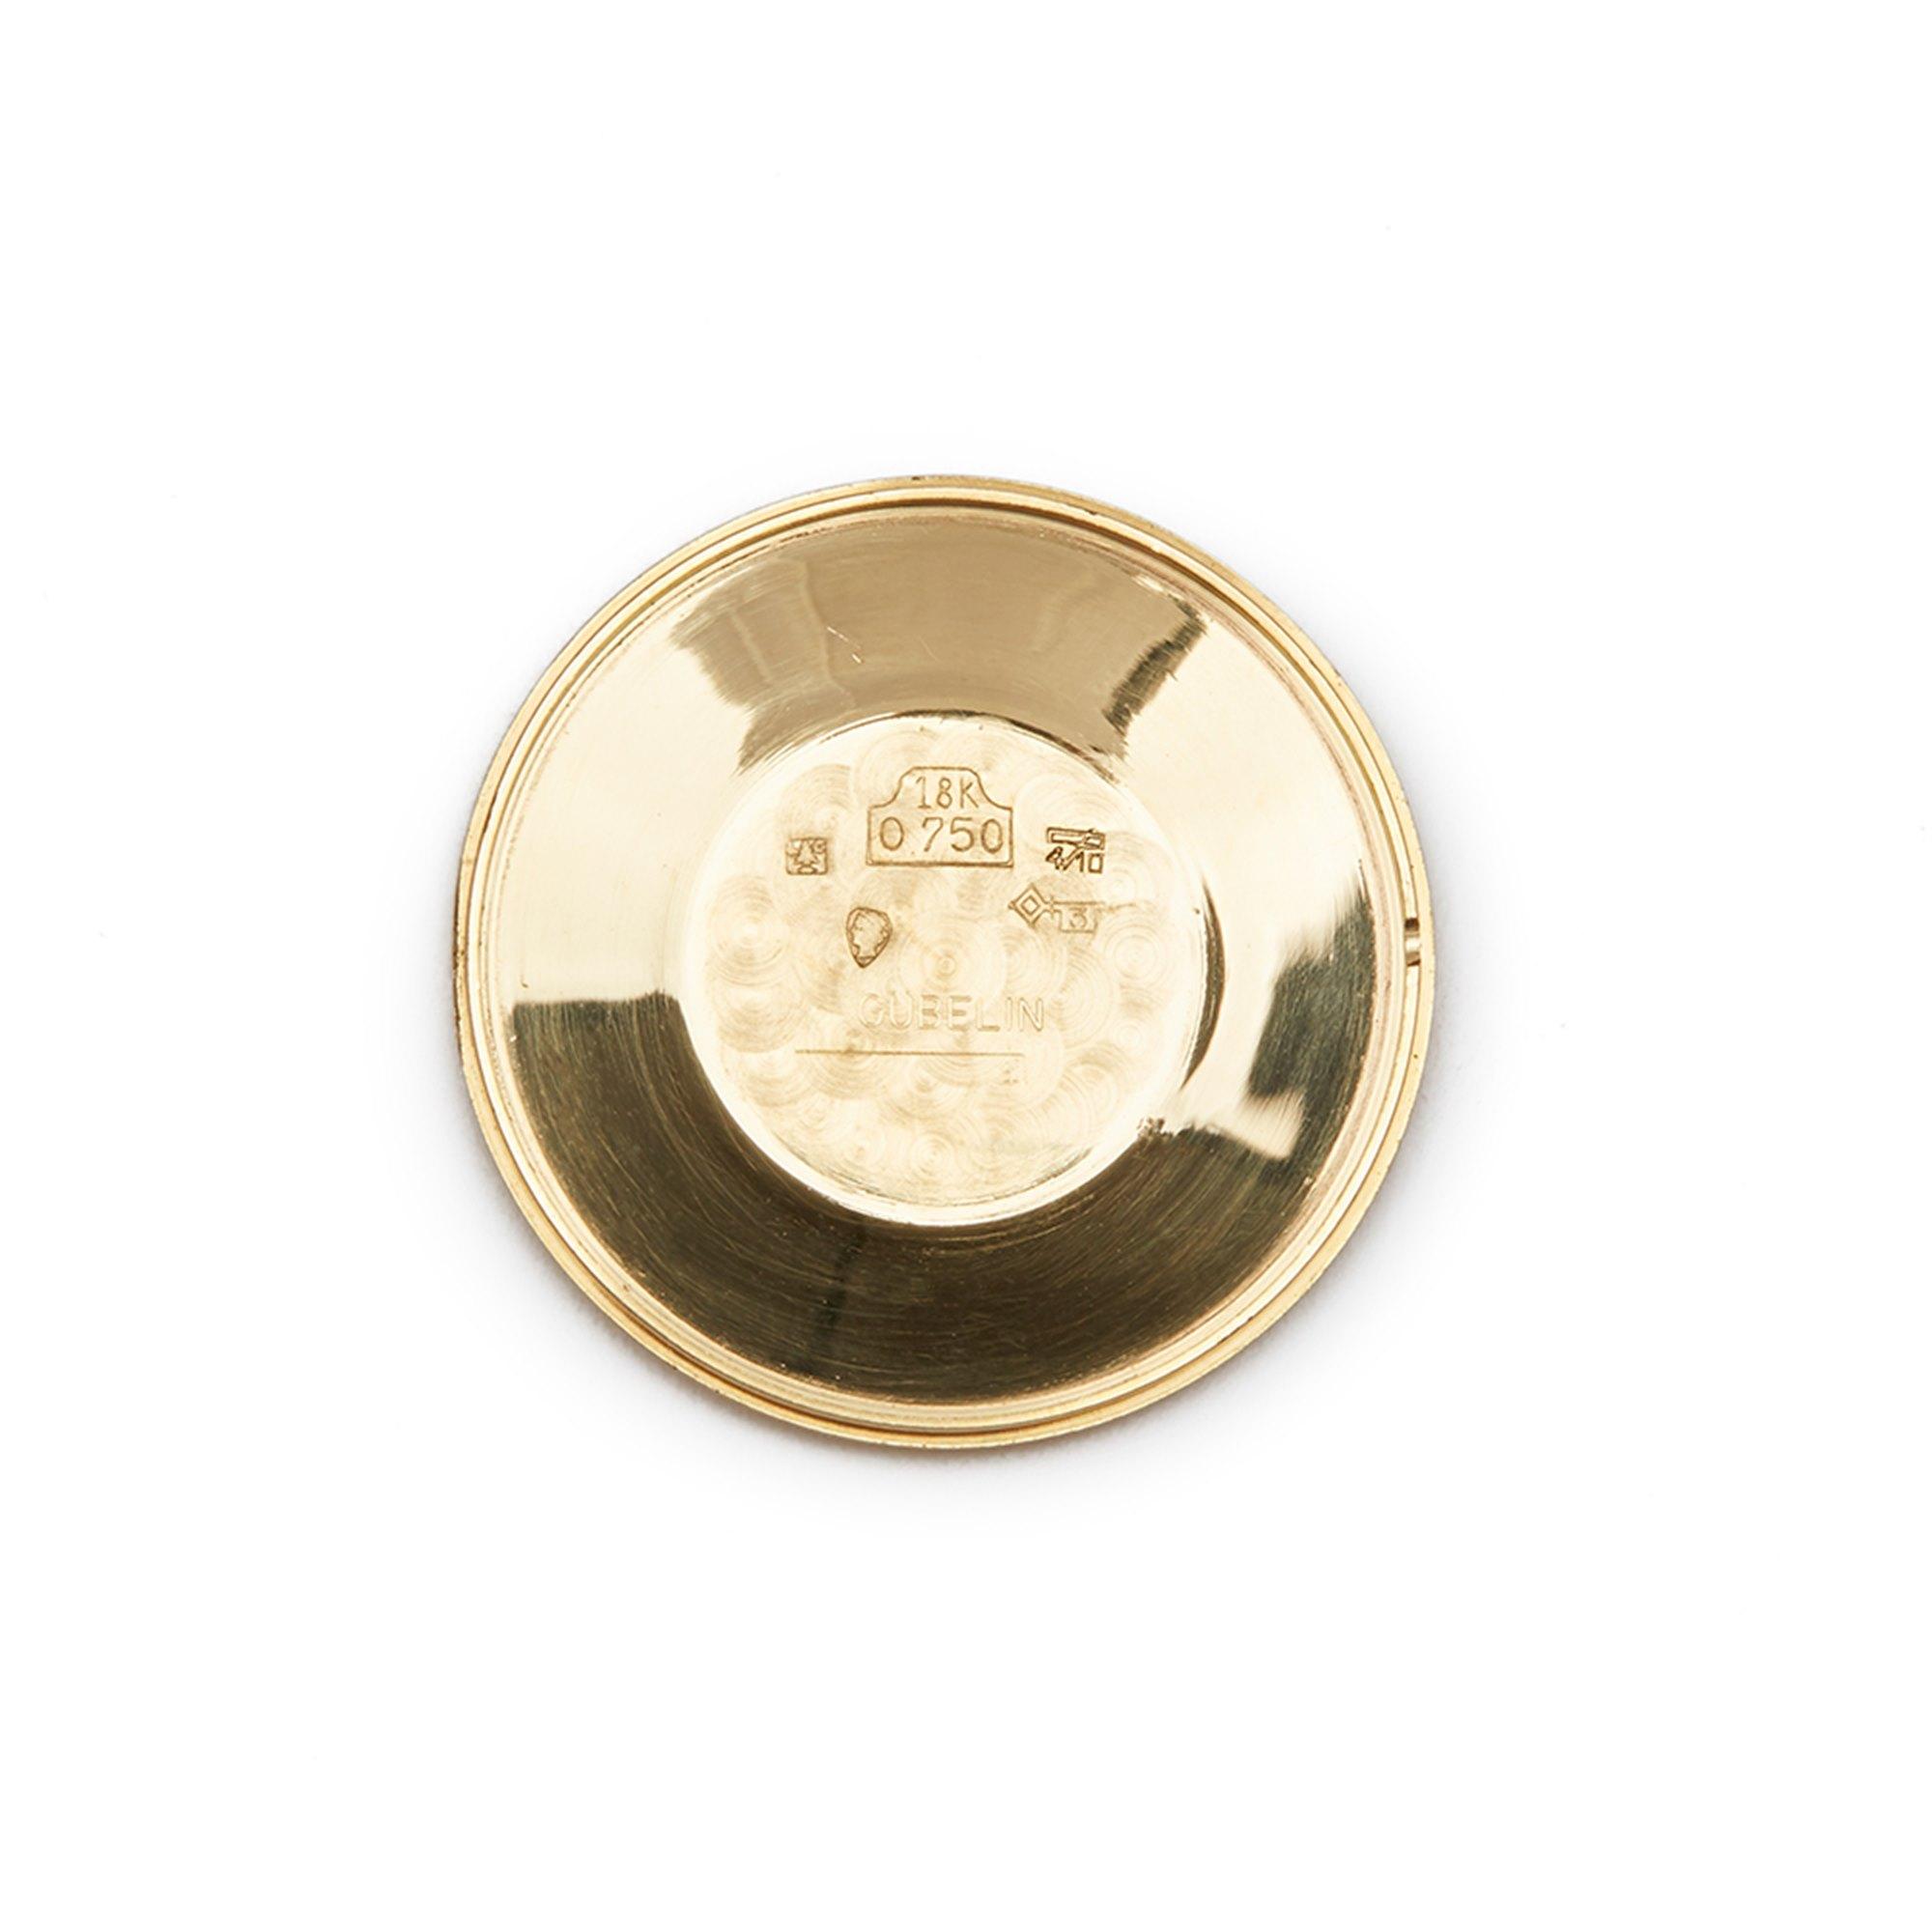 Lecoultre / Gübelin Vintage Yellow Gold 3520